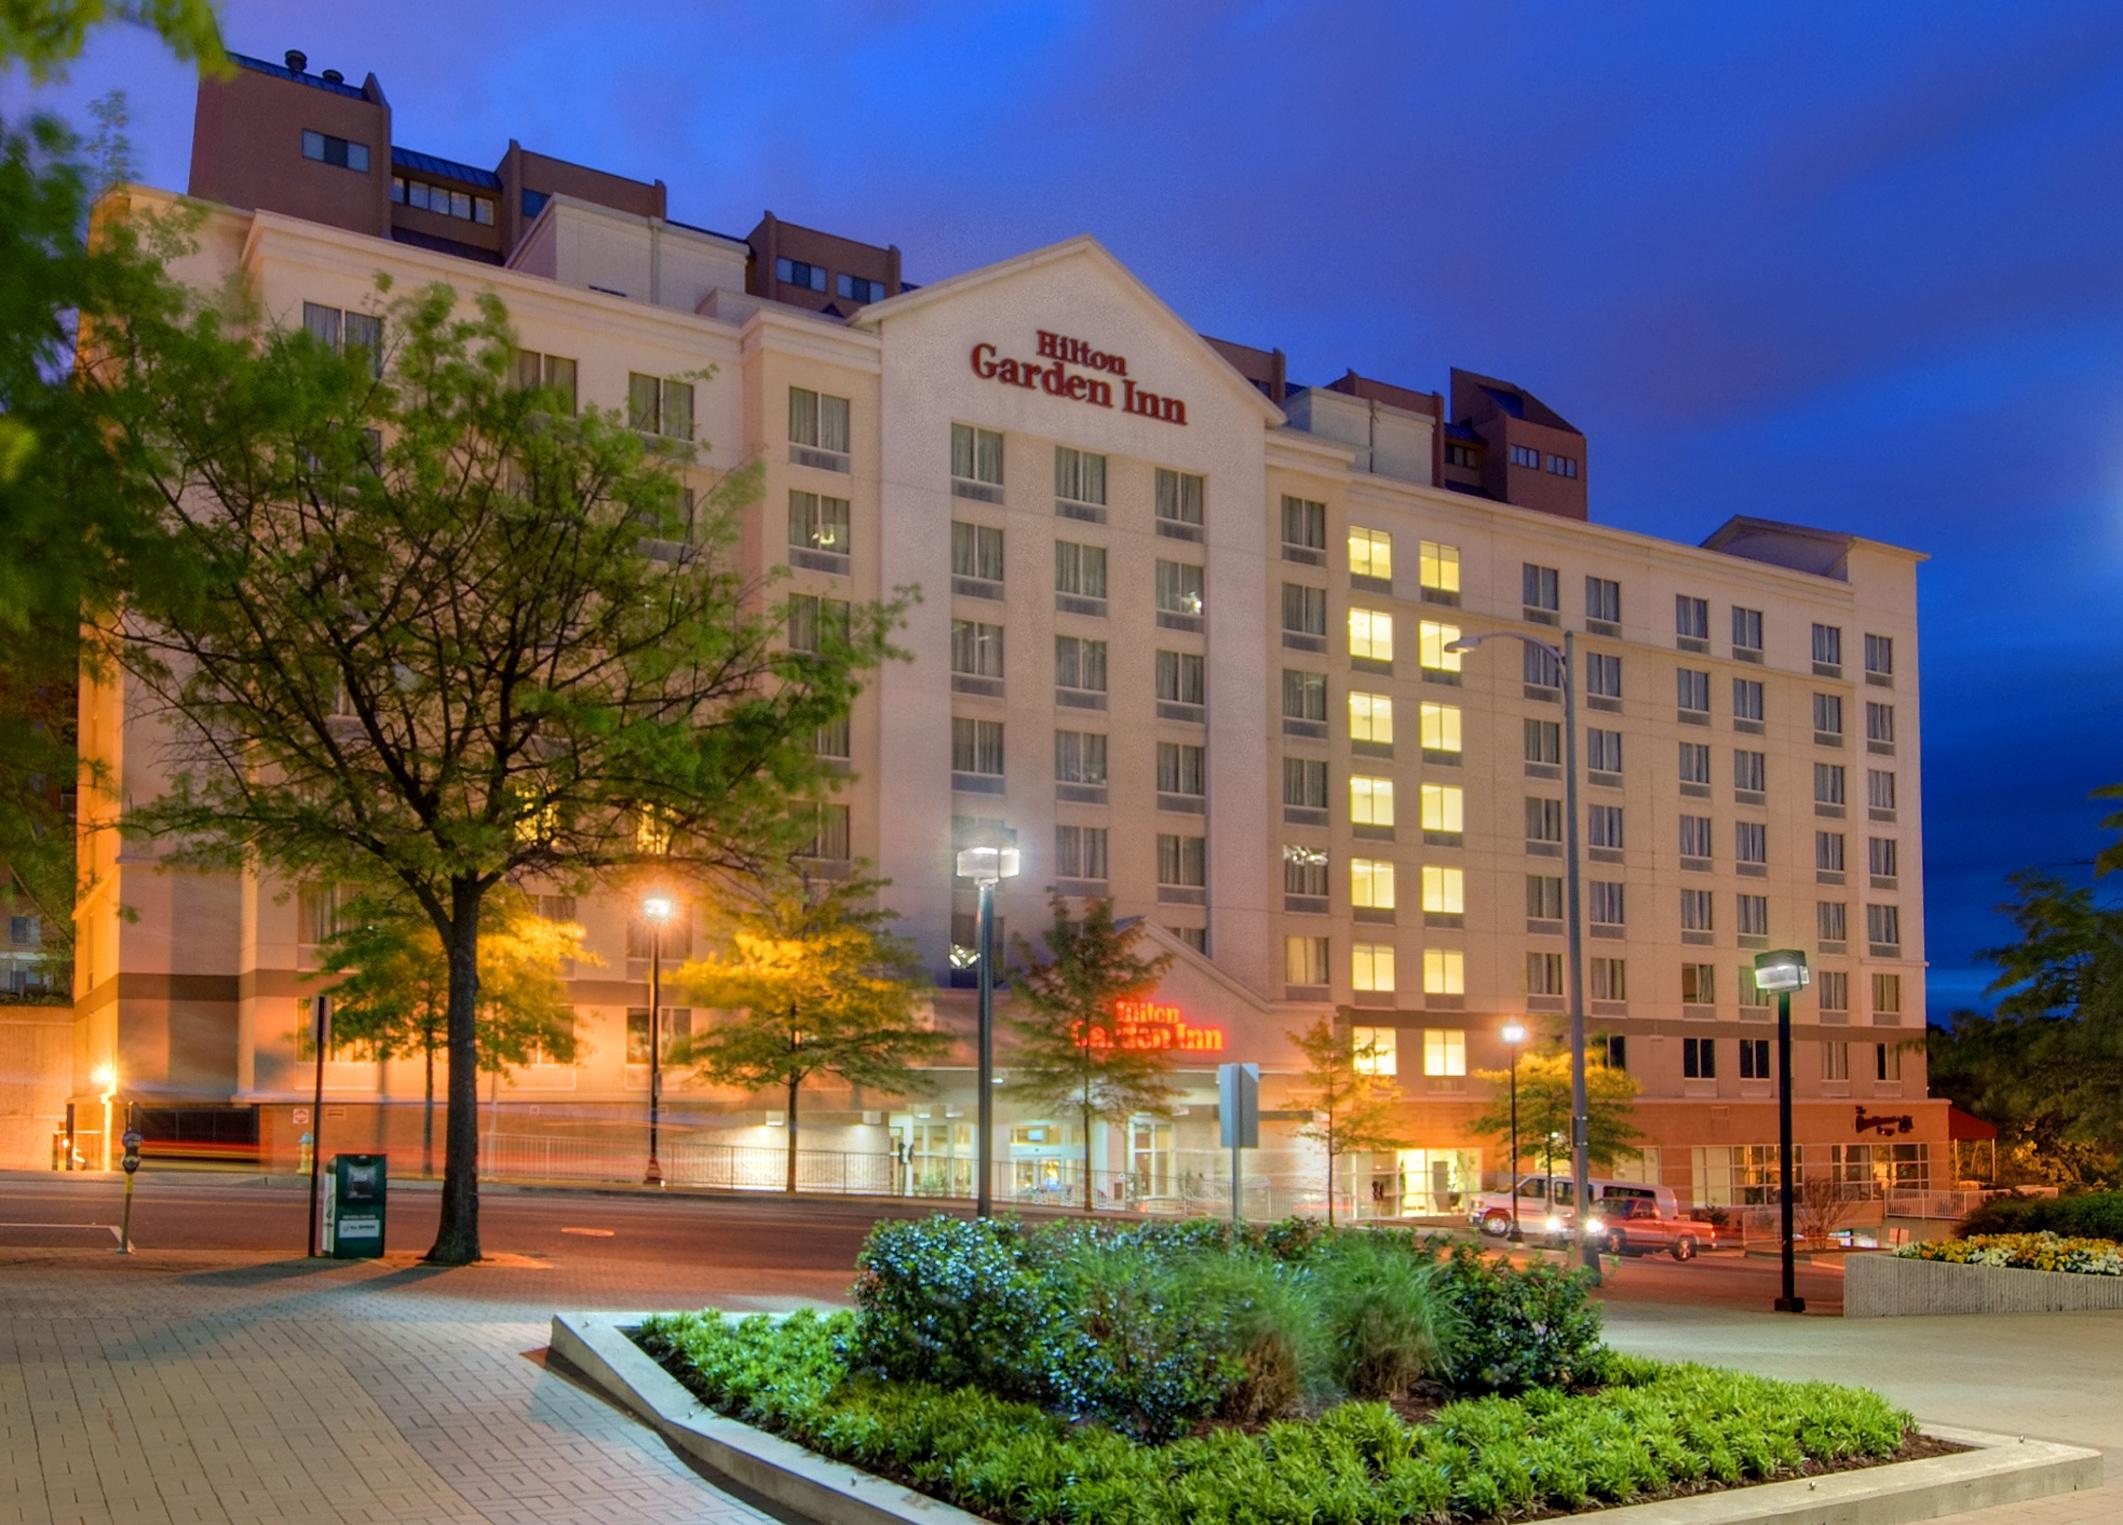 Hilton Garden Inn Arlington Courthouse Plaza in Arlington VA